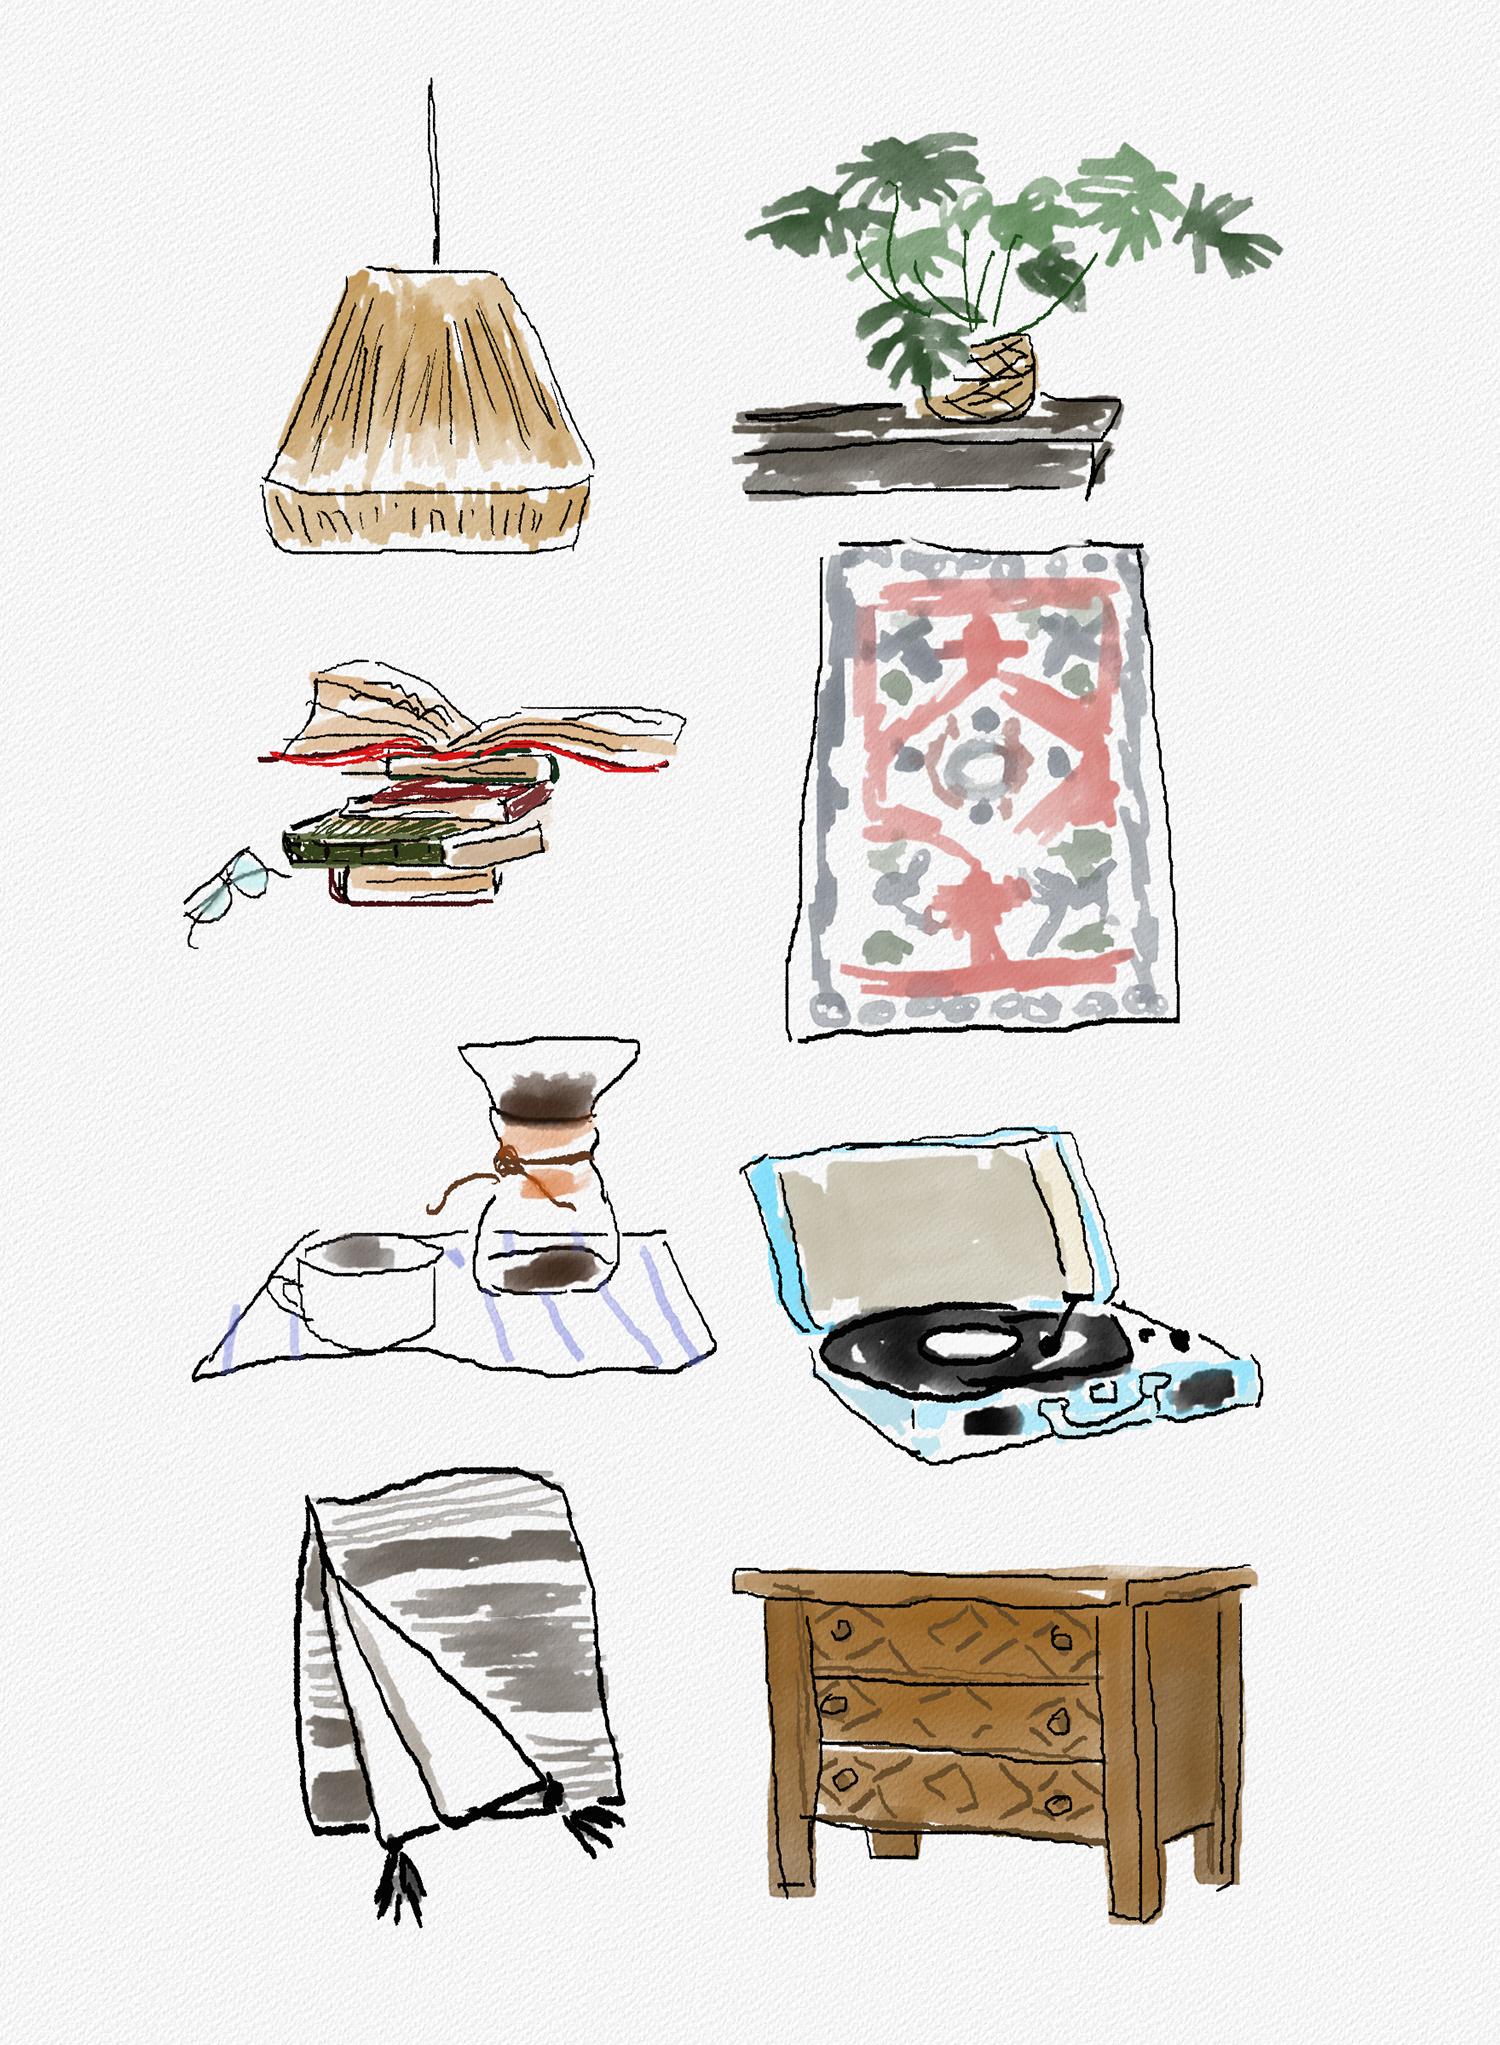 Masterly Livvyland Blog Olivia Watson Elements House Home Decor Bohemian Kimberlee Watson Art Elements Home Decor Tucson Elements Home Decor Gifts home decor Elements Home Decor